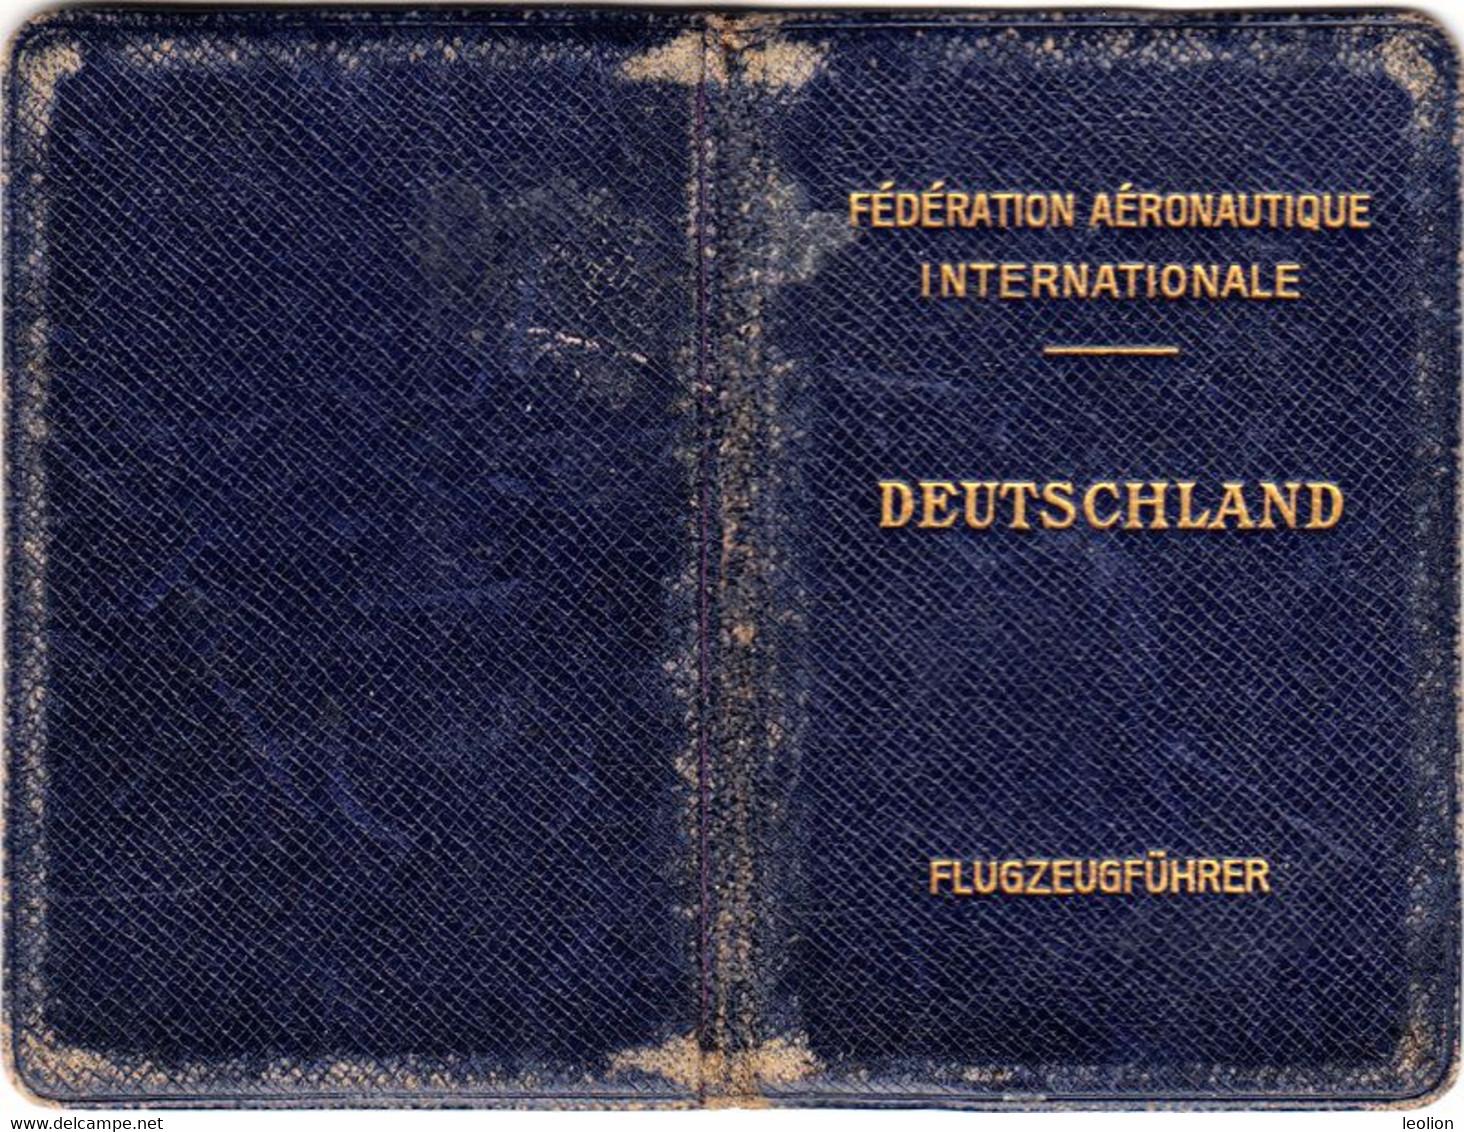 Original Antique German Pilot License Of 1916 For A Two-decker Plane Flugzeugfuehrer Brevete Pilote Aviateur - Historical Documents